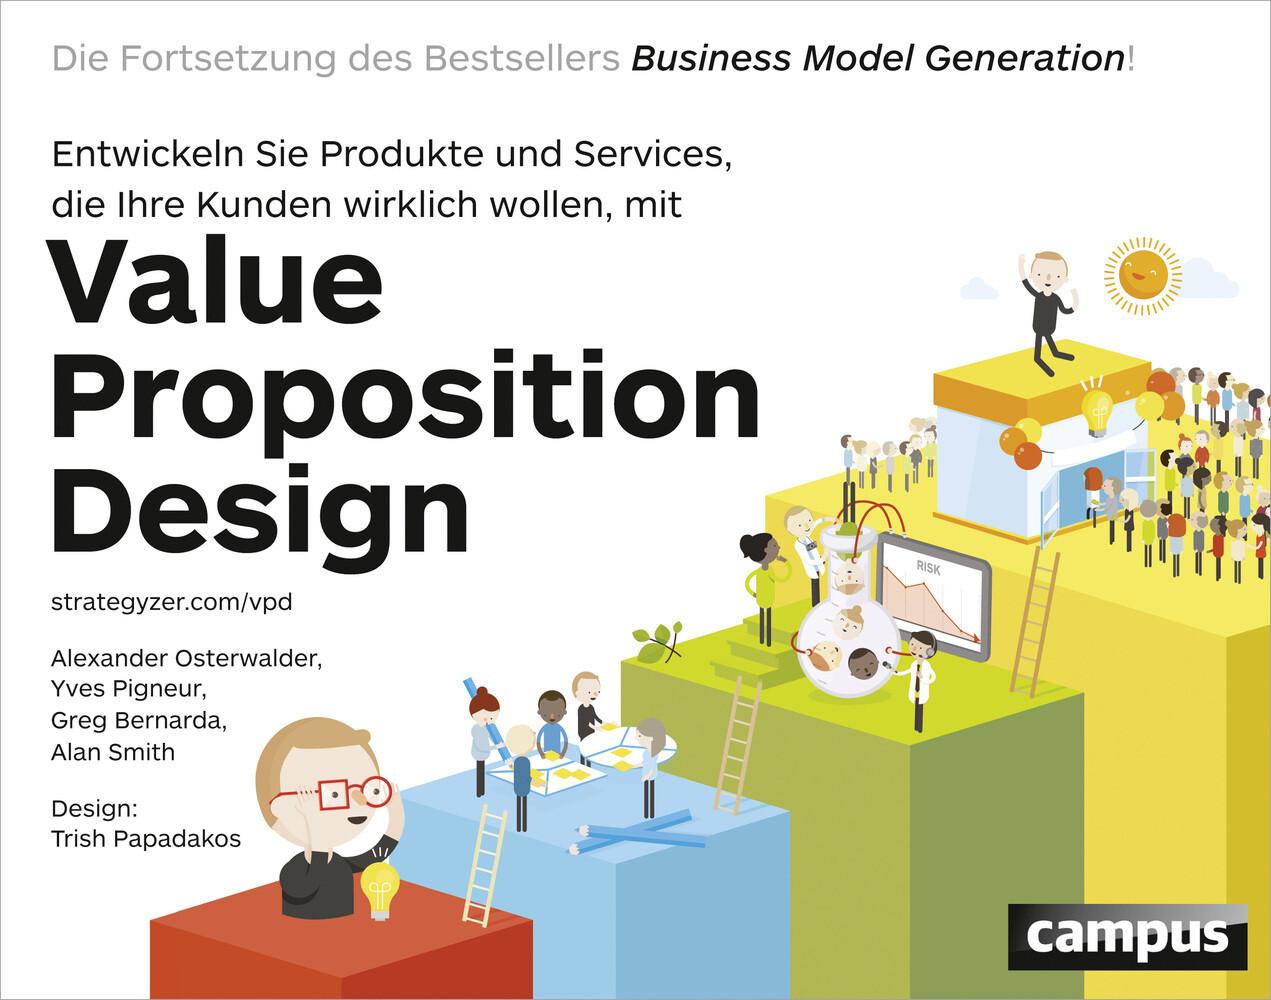 Value Proposition Design als Buch